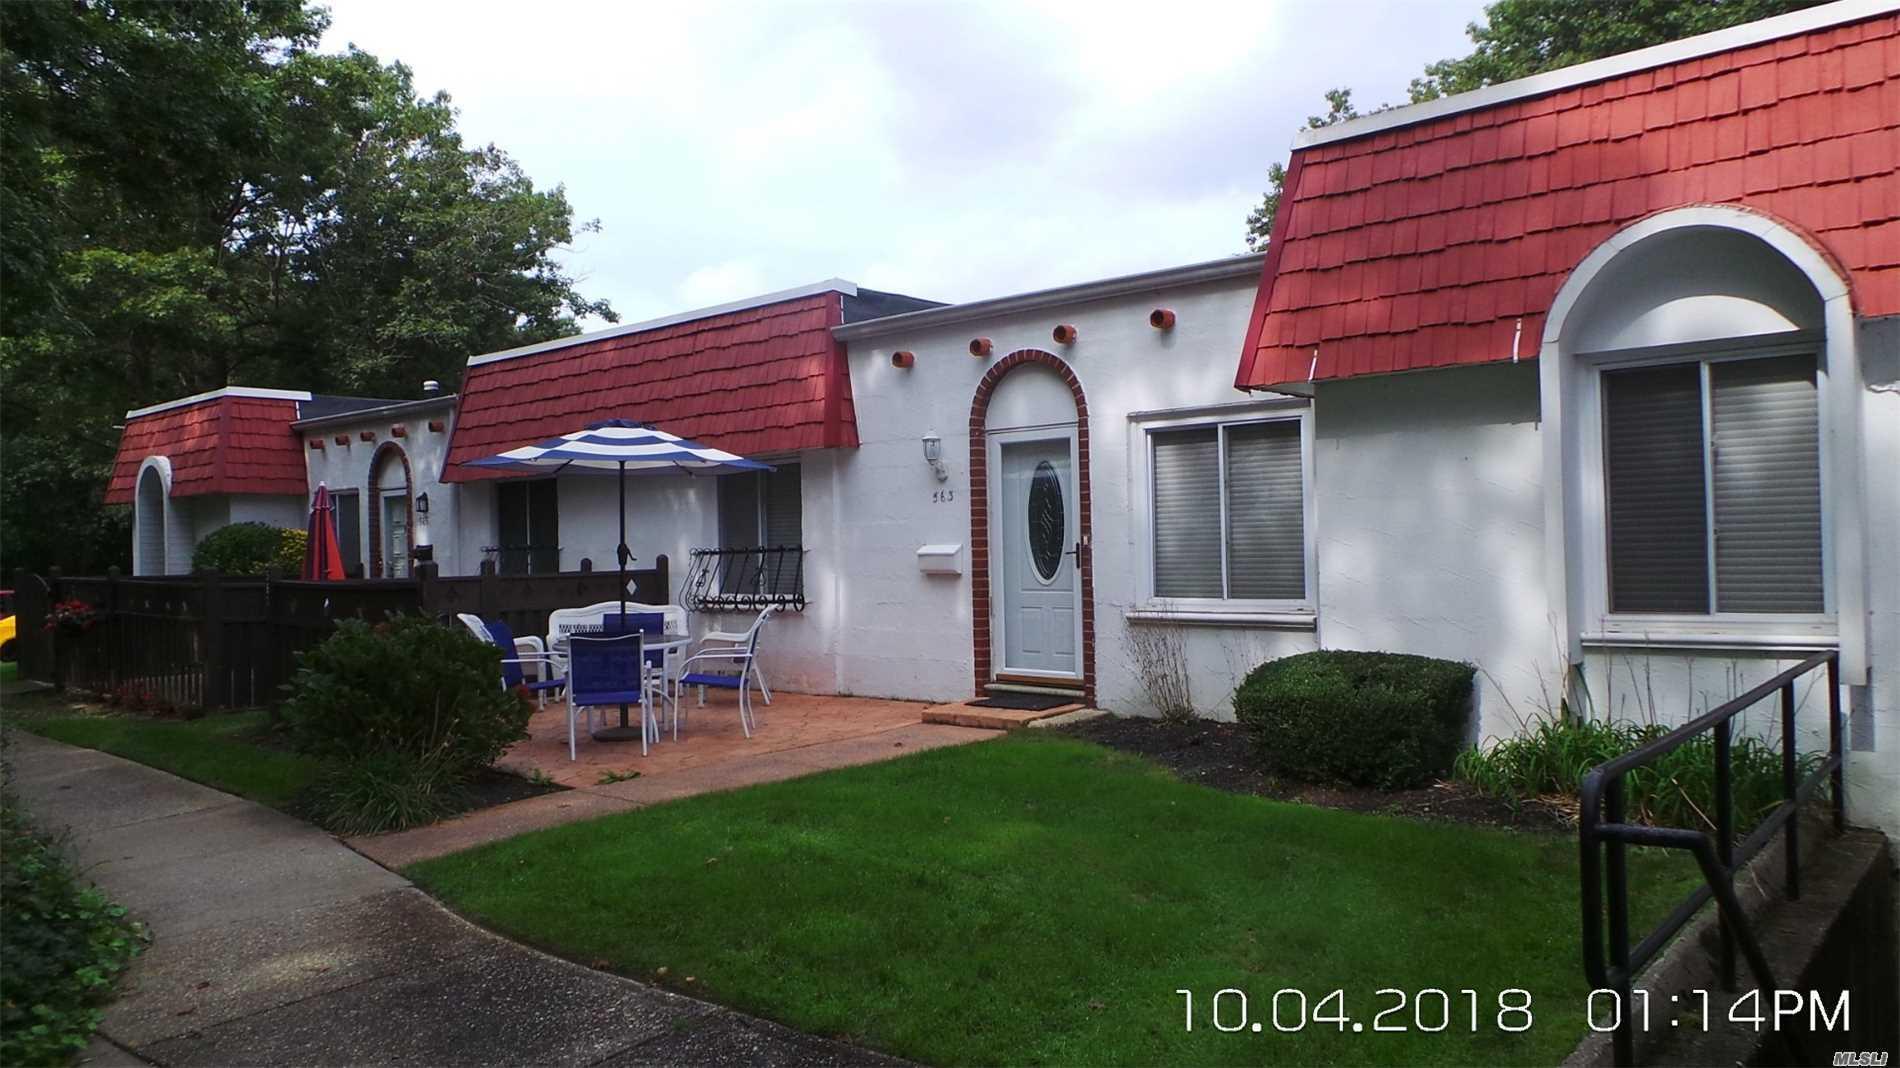 Property for sale at 563 Blue Ridge Dr, Medford,  NY 11763